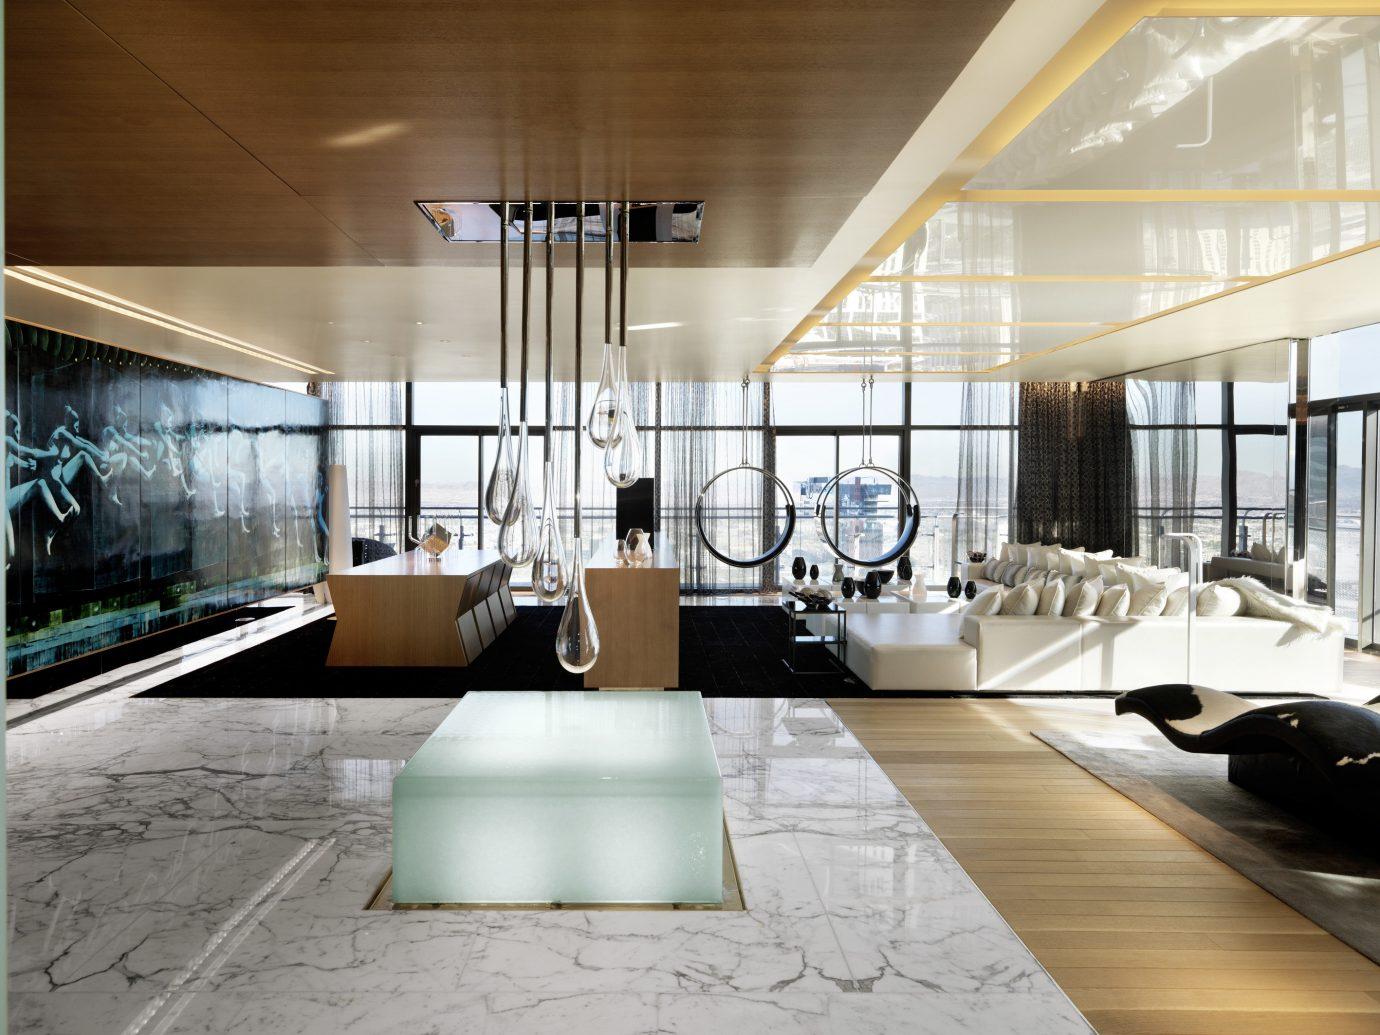 Living room in the Bentel & Bentel Penthouse Suites, The Cosmopolitan of Las Vegas